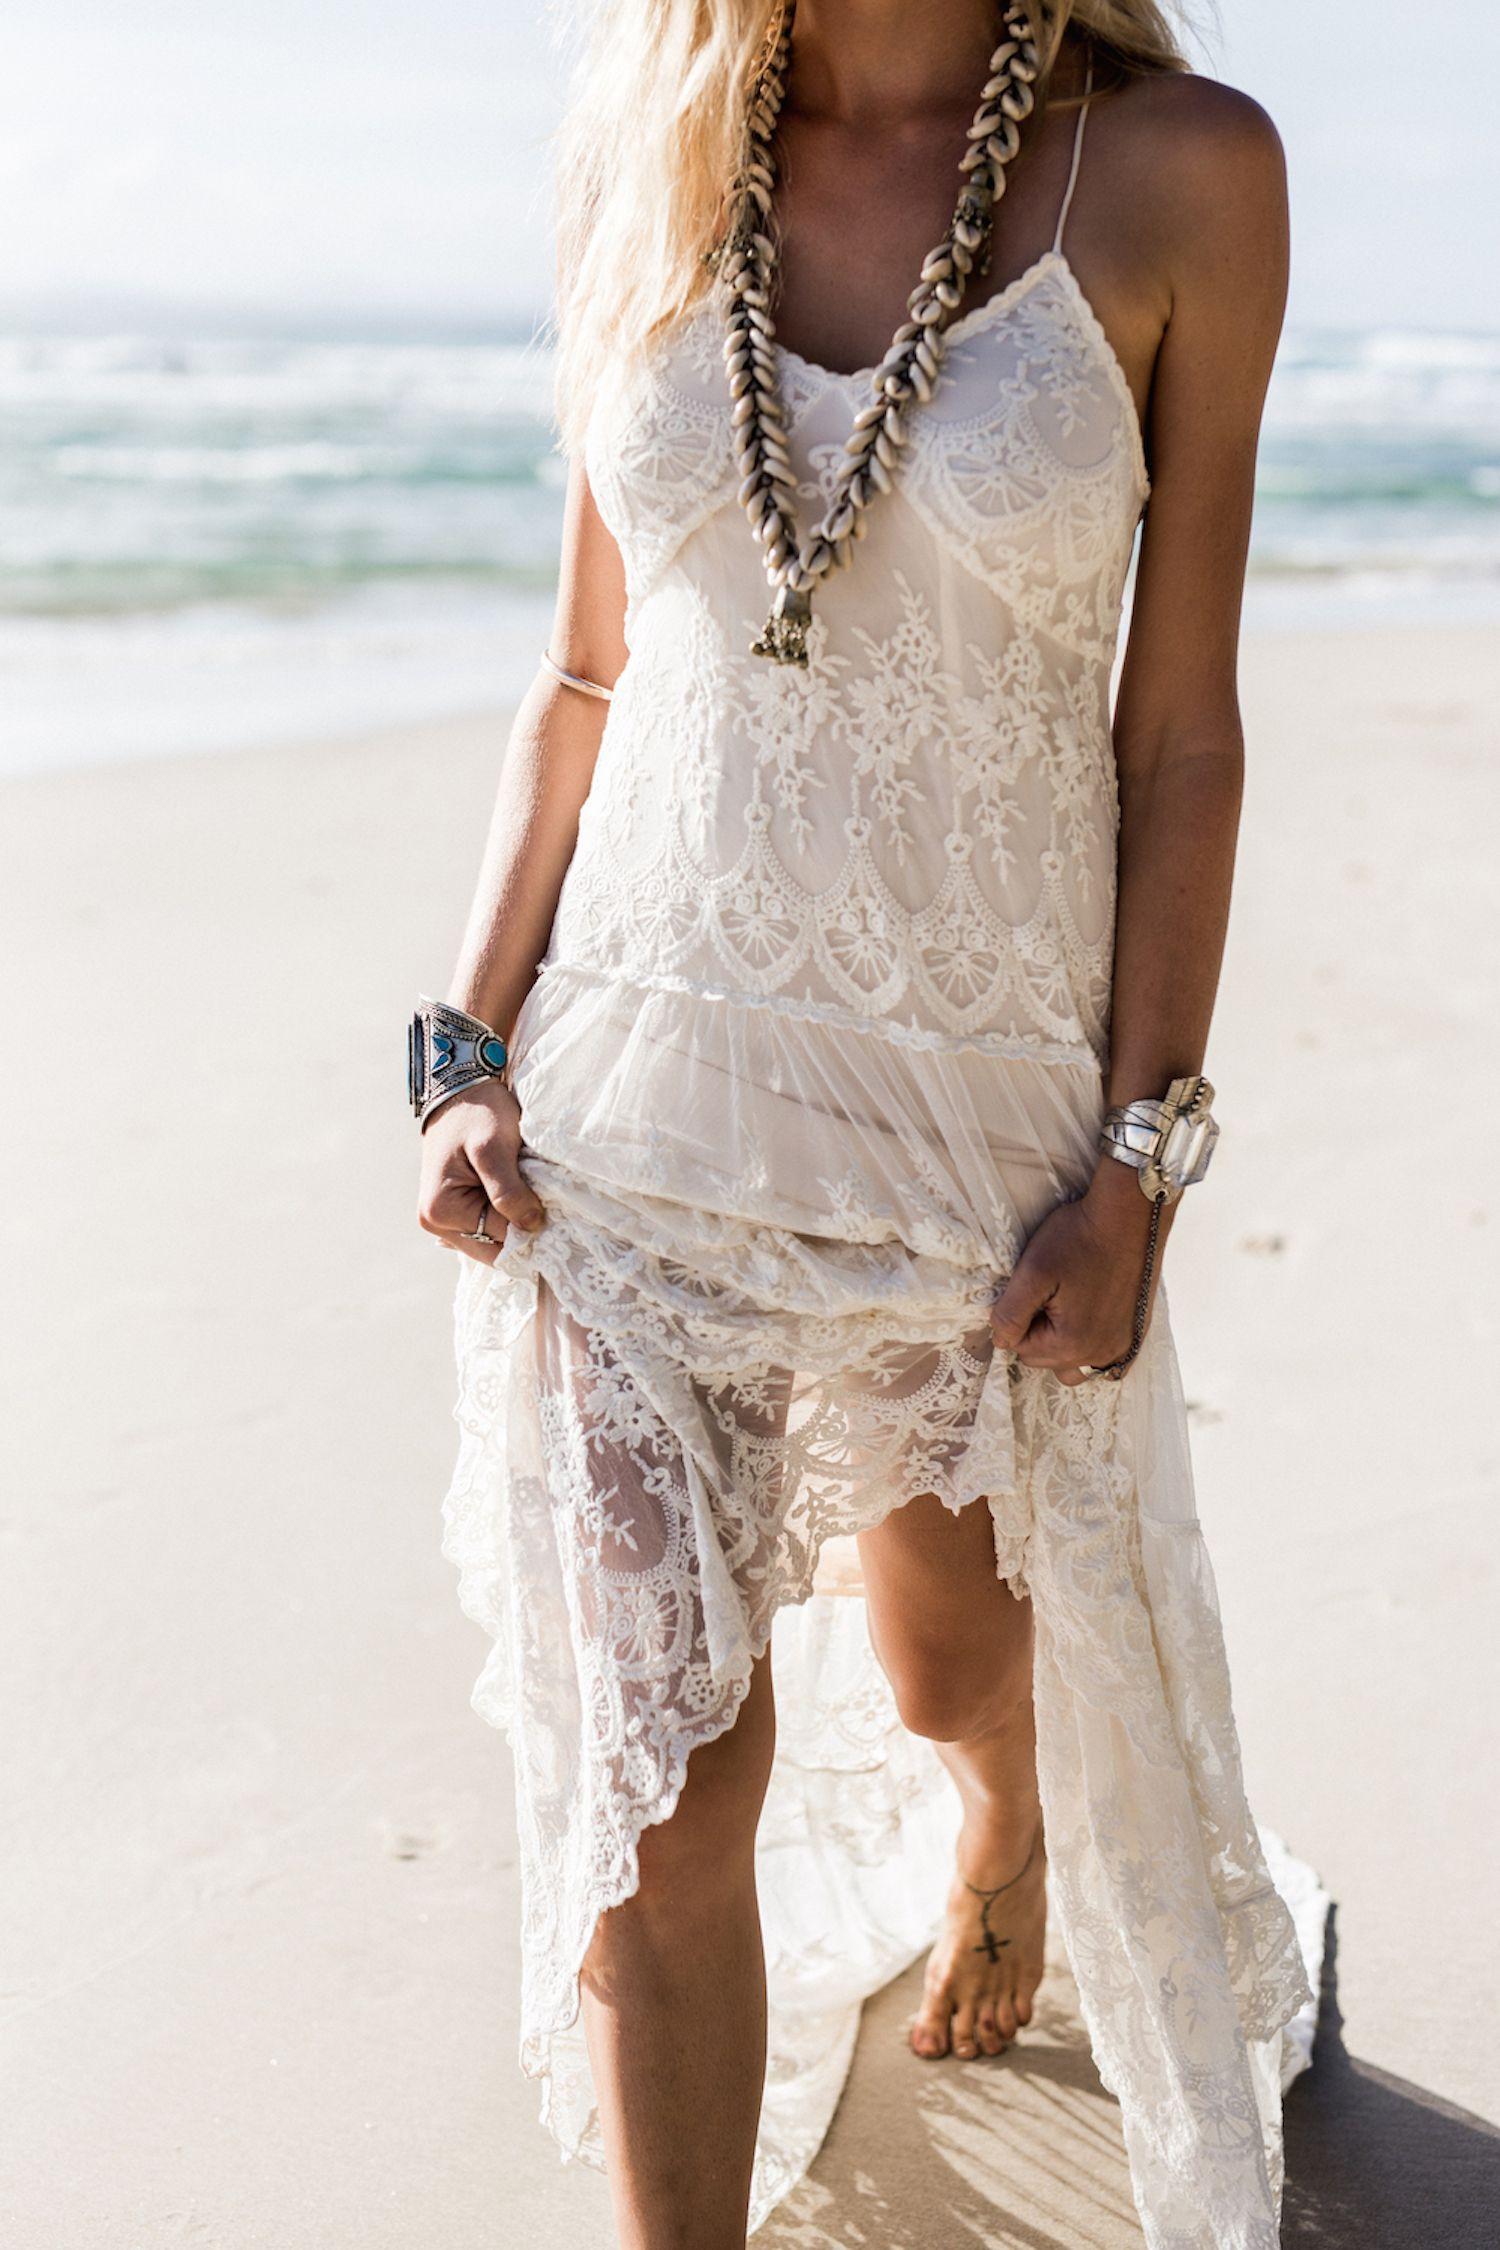 Swept away Spell Designs Blog Casual beach wedding